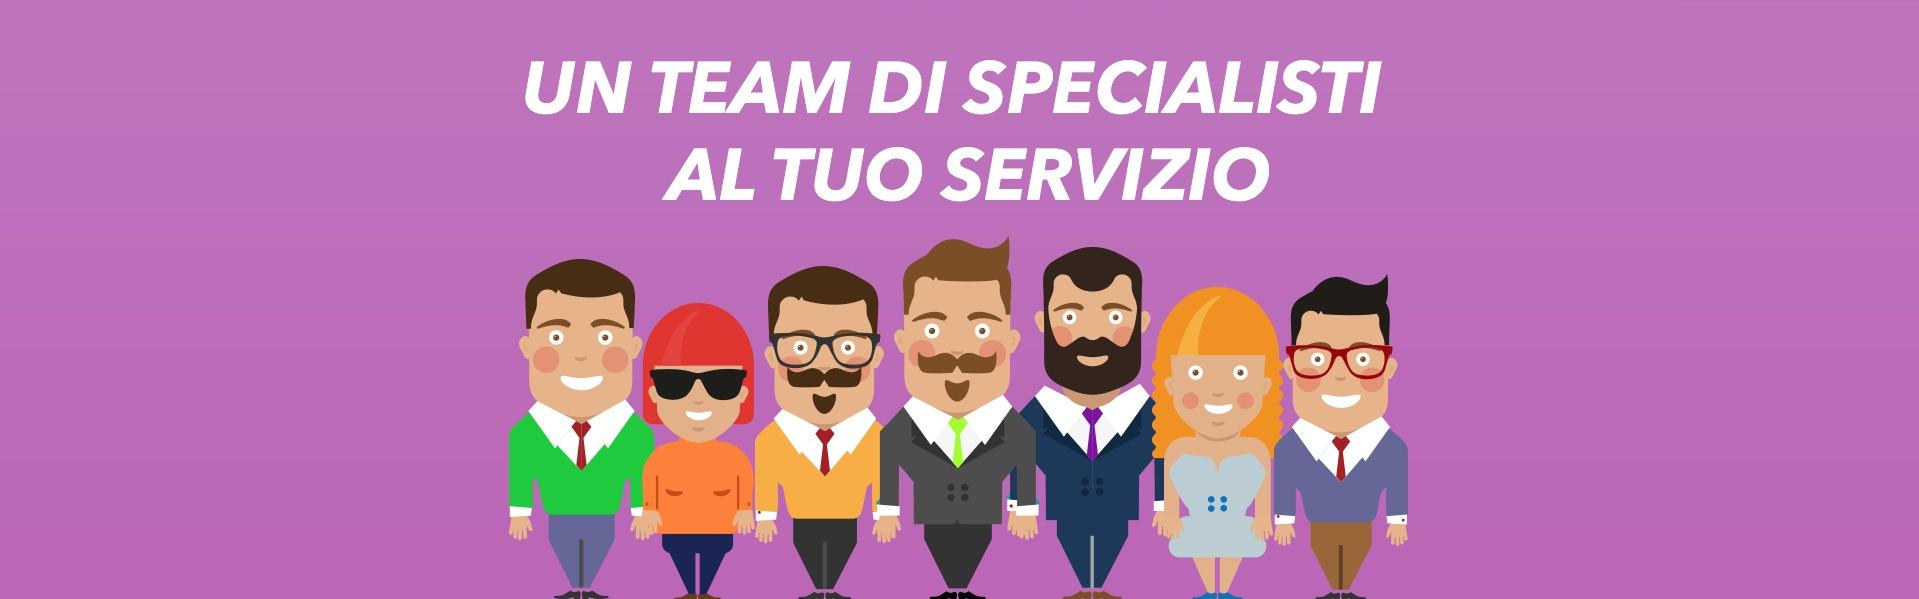 Home_banner_specialisti2.jpg